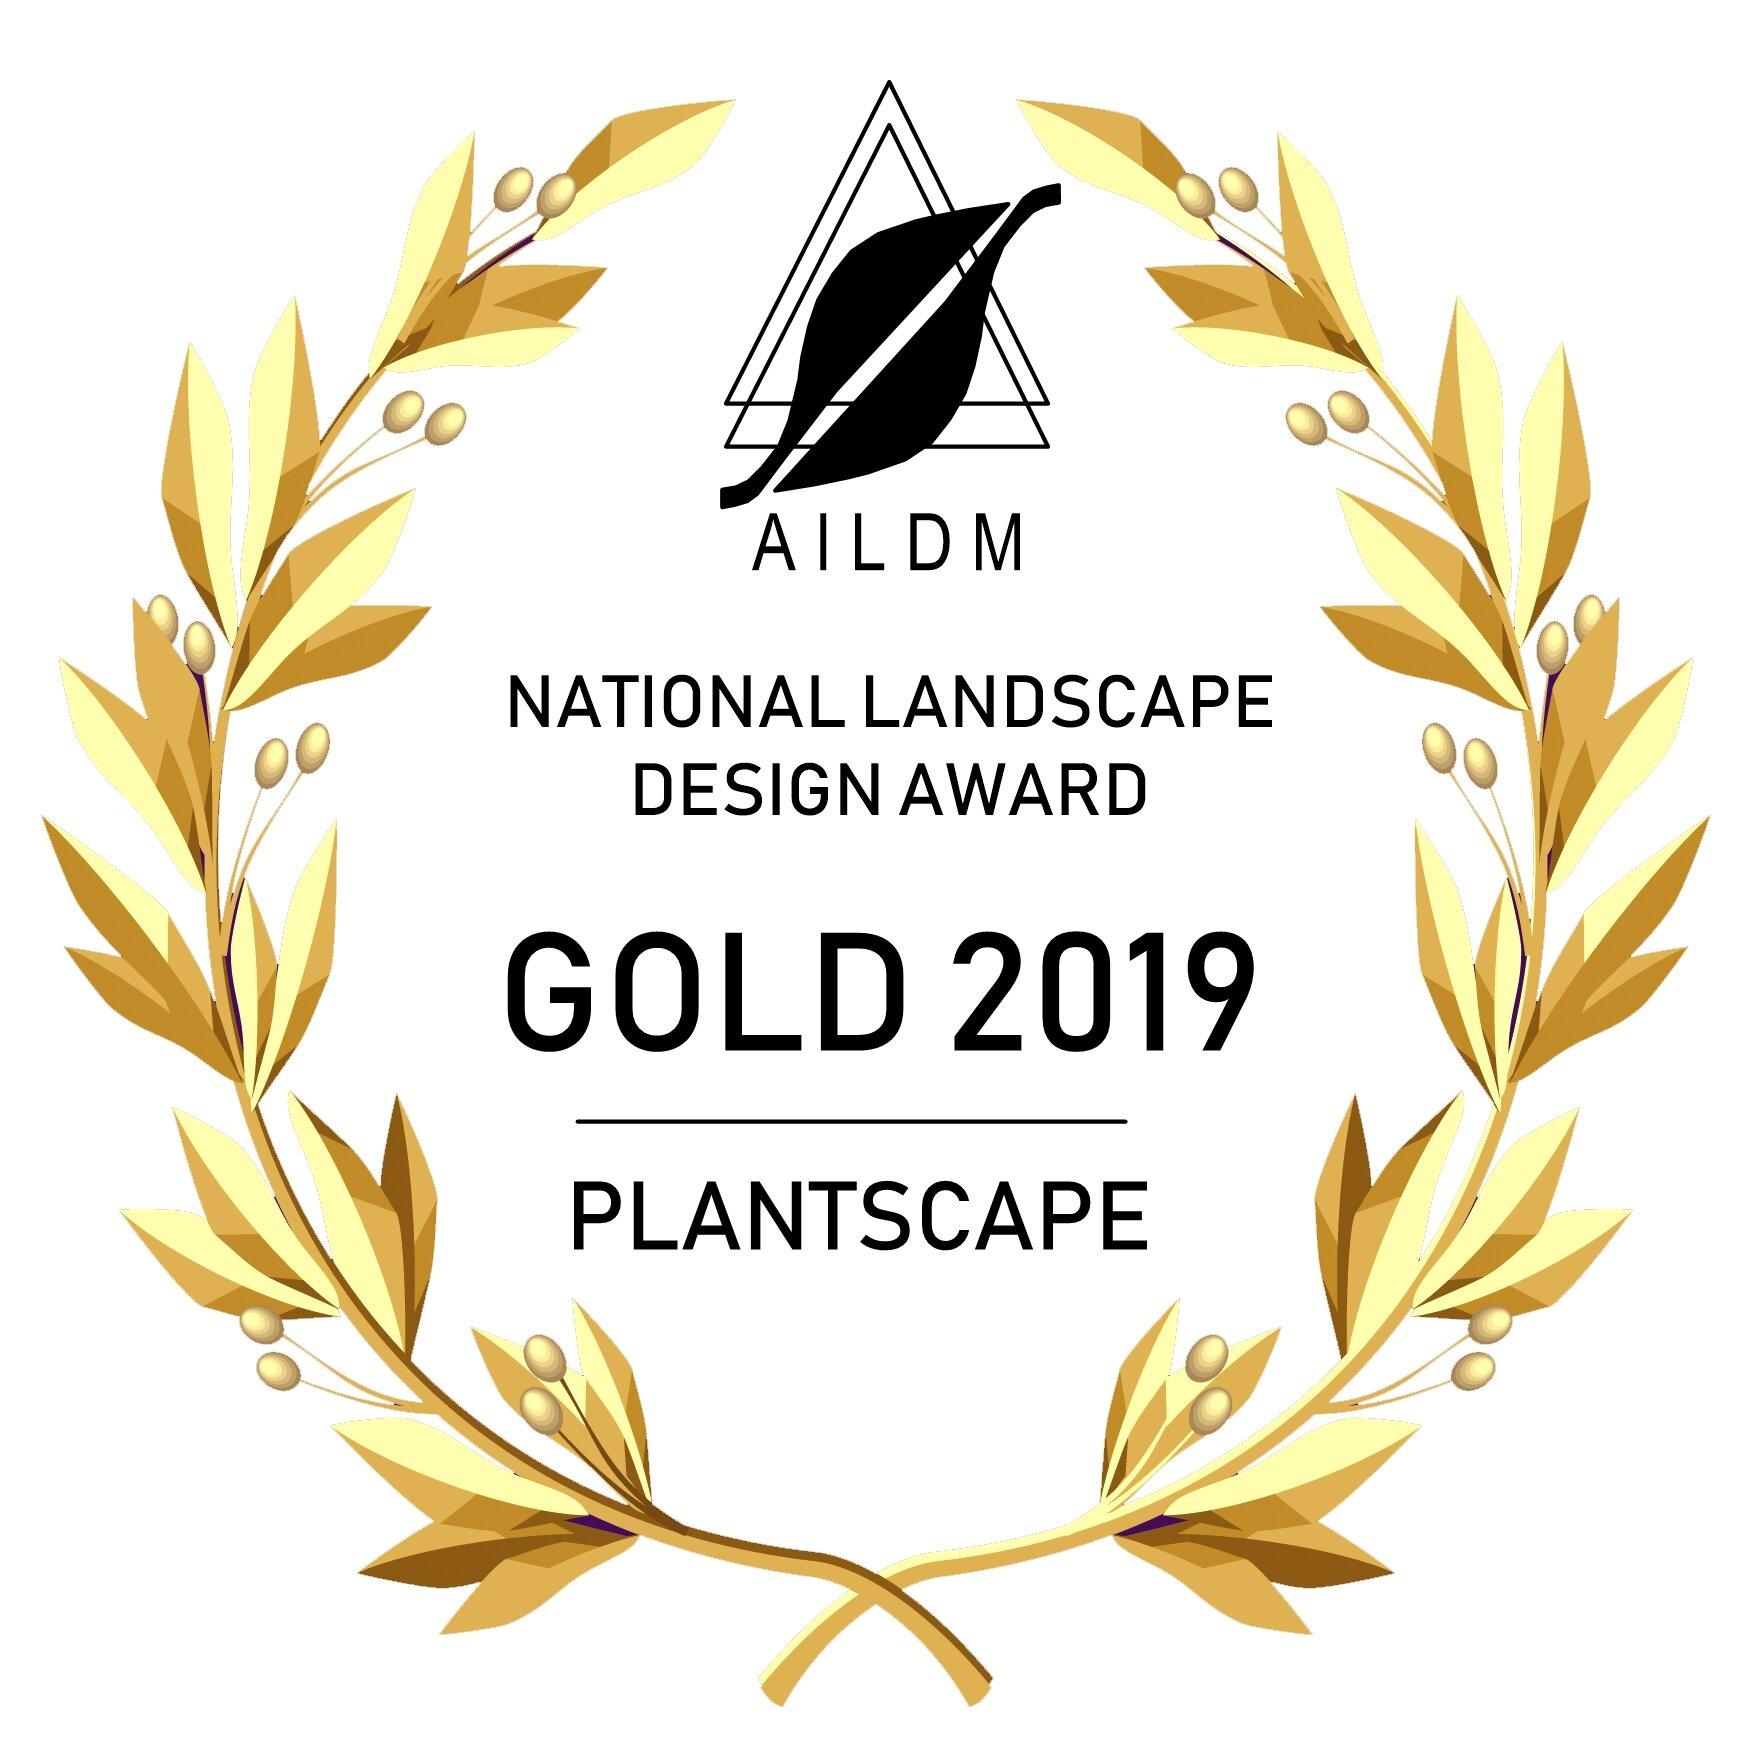 AILDM 2019 MEDAL ICON GOLD_1.jpg